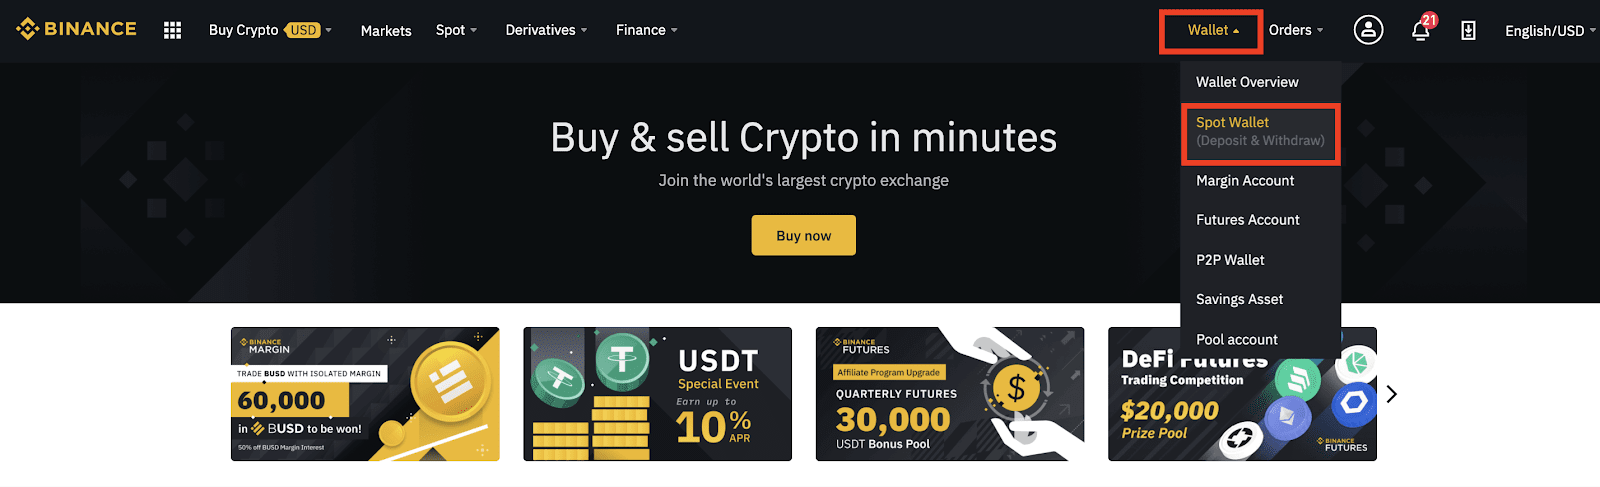 ripple cryptocurrency brokeris